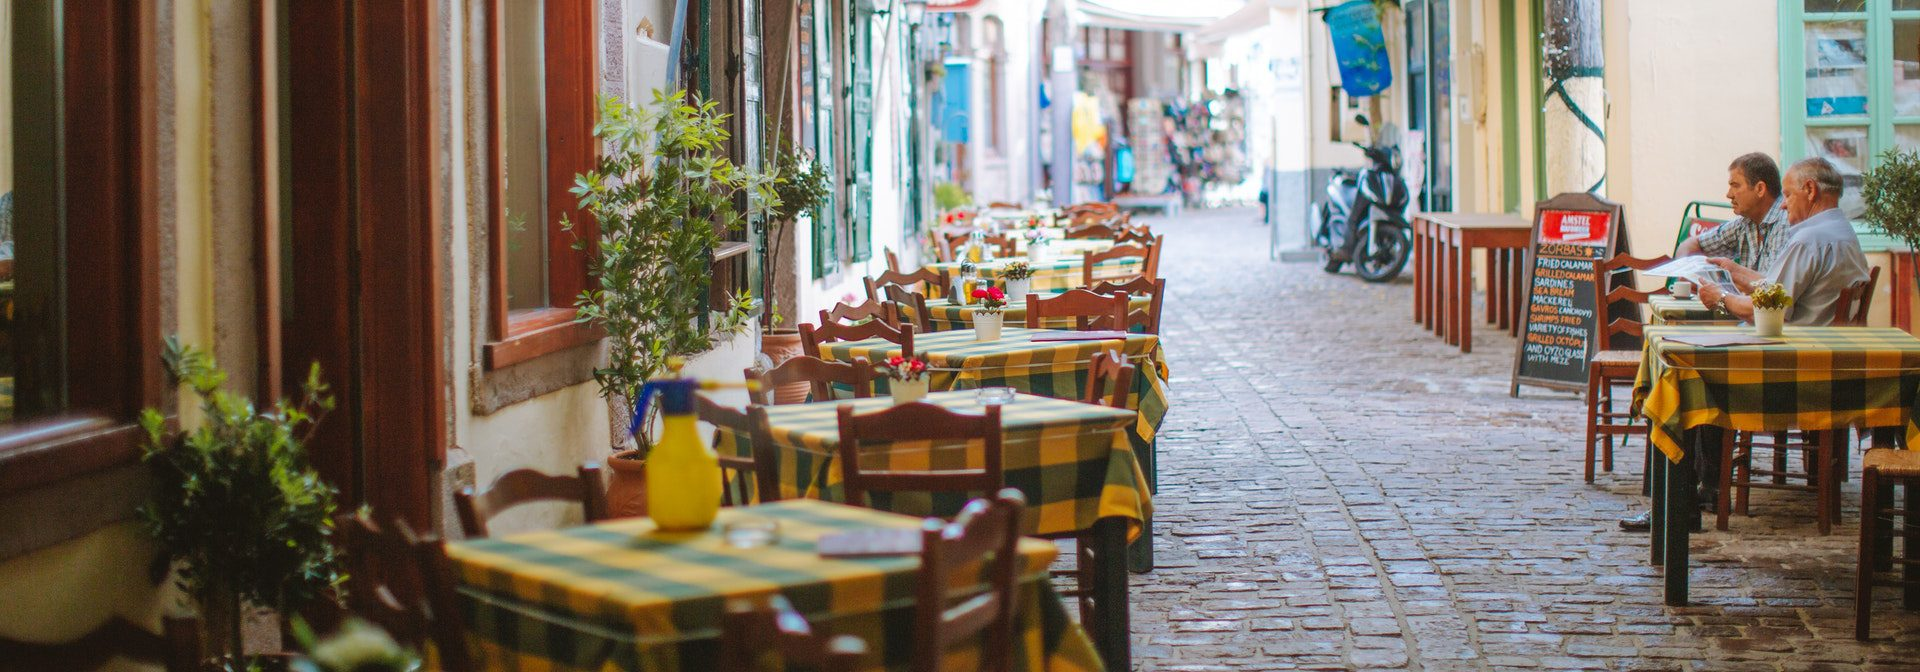 restaurants coronavirus